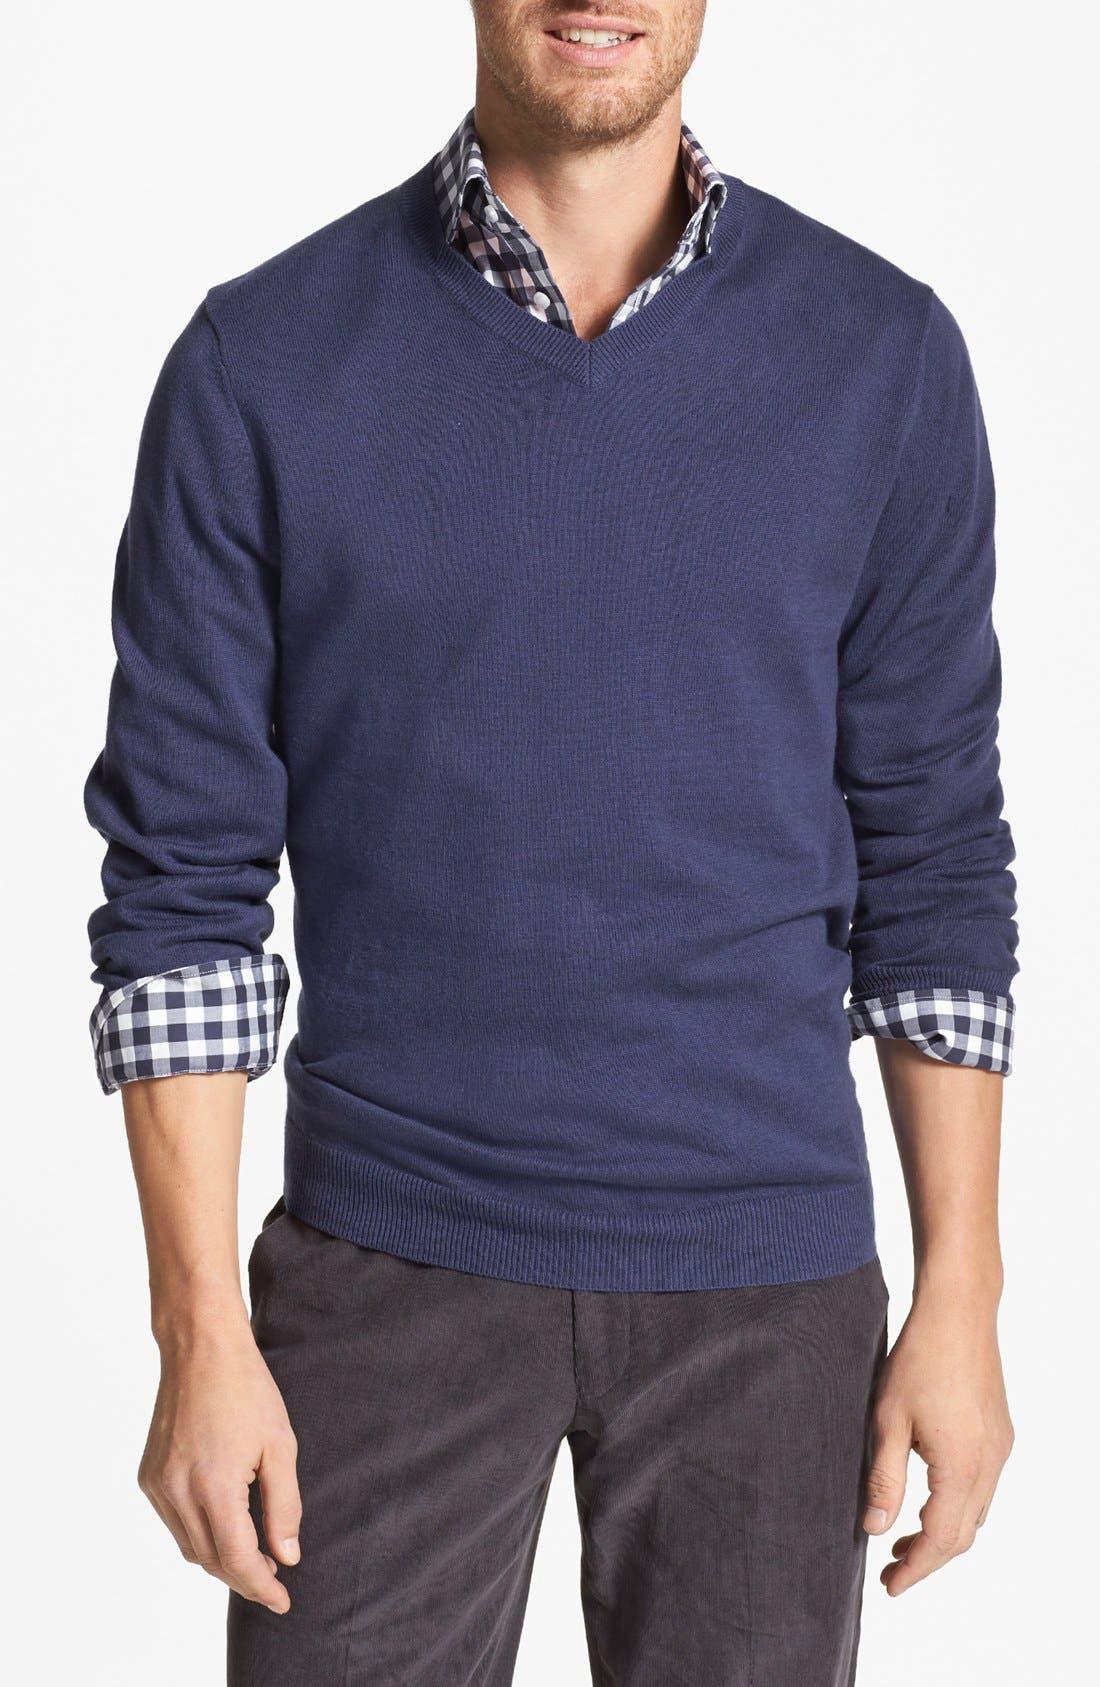 Main Image - Wallin & Bros. Trim Fit V-Neck Cotton & Cashmere Sweater